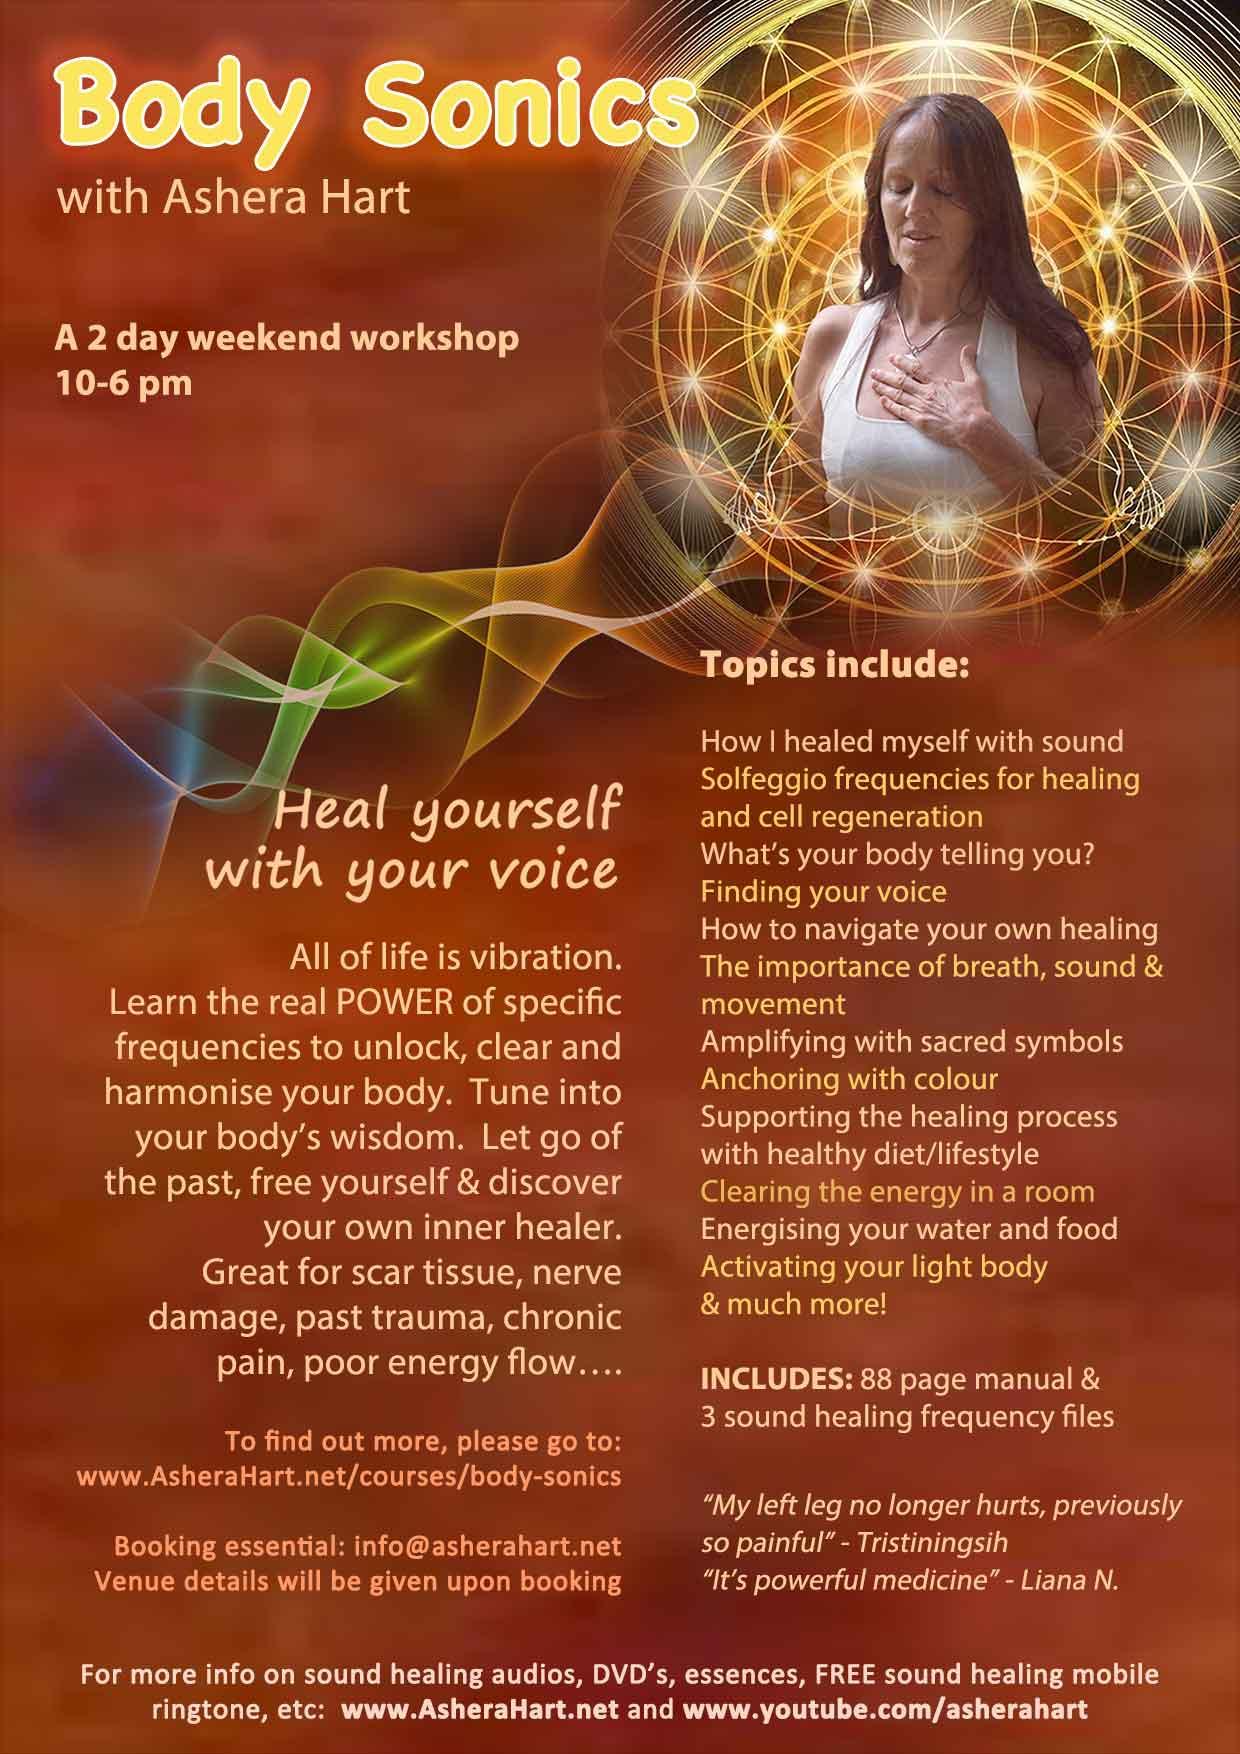 solfeggio sound healing, Body Sonics, cellular healing, stress relief, shamanic practice, sound healing